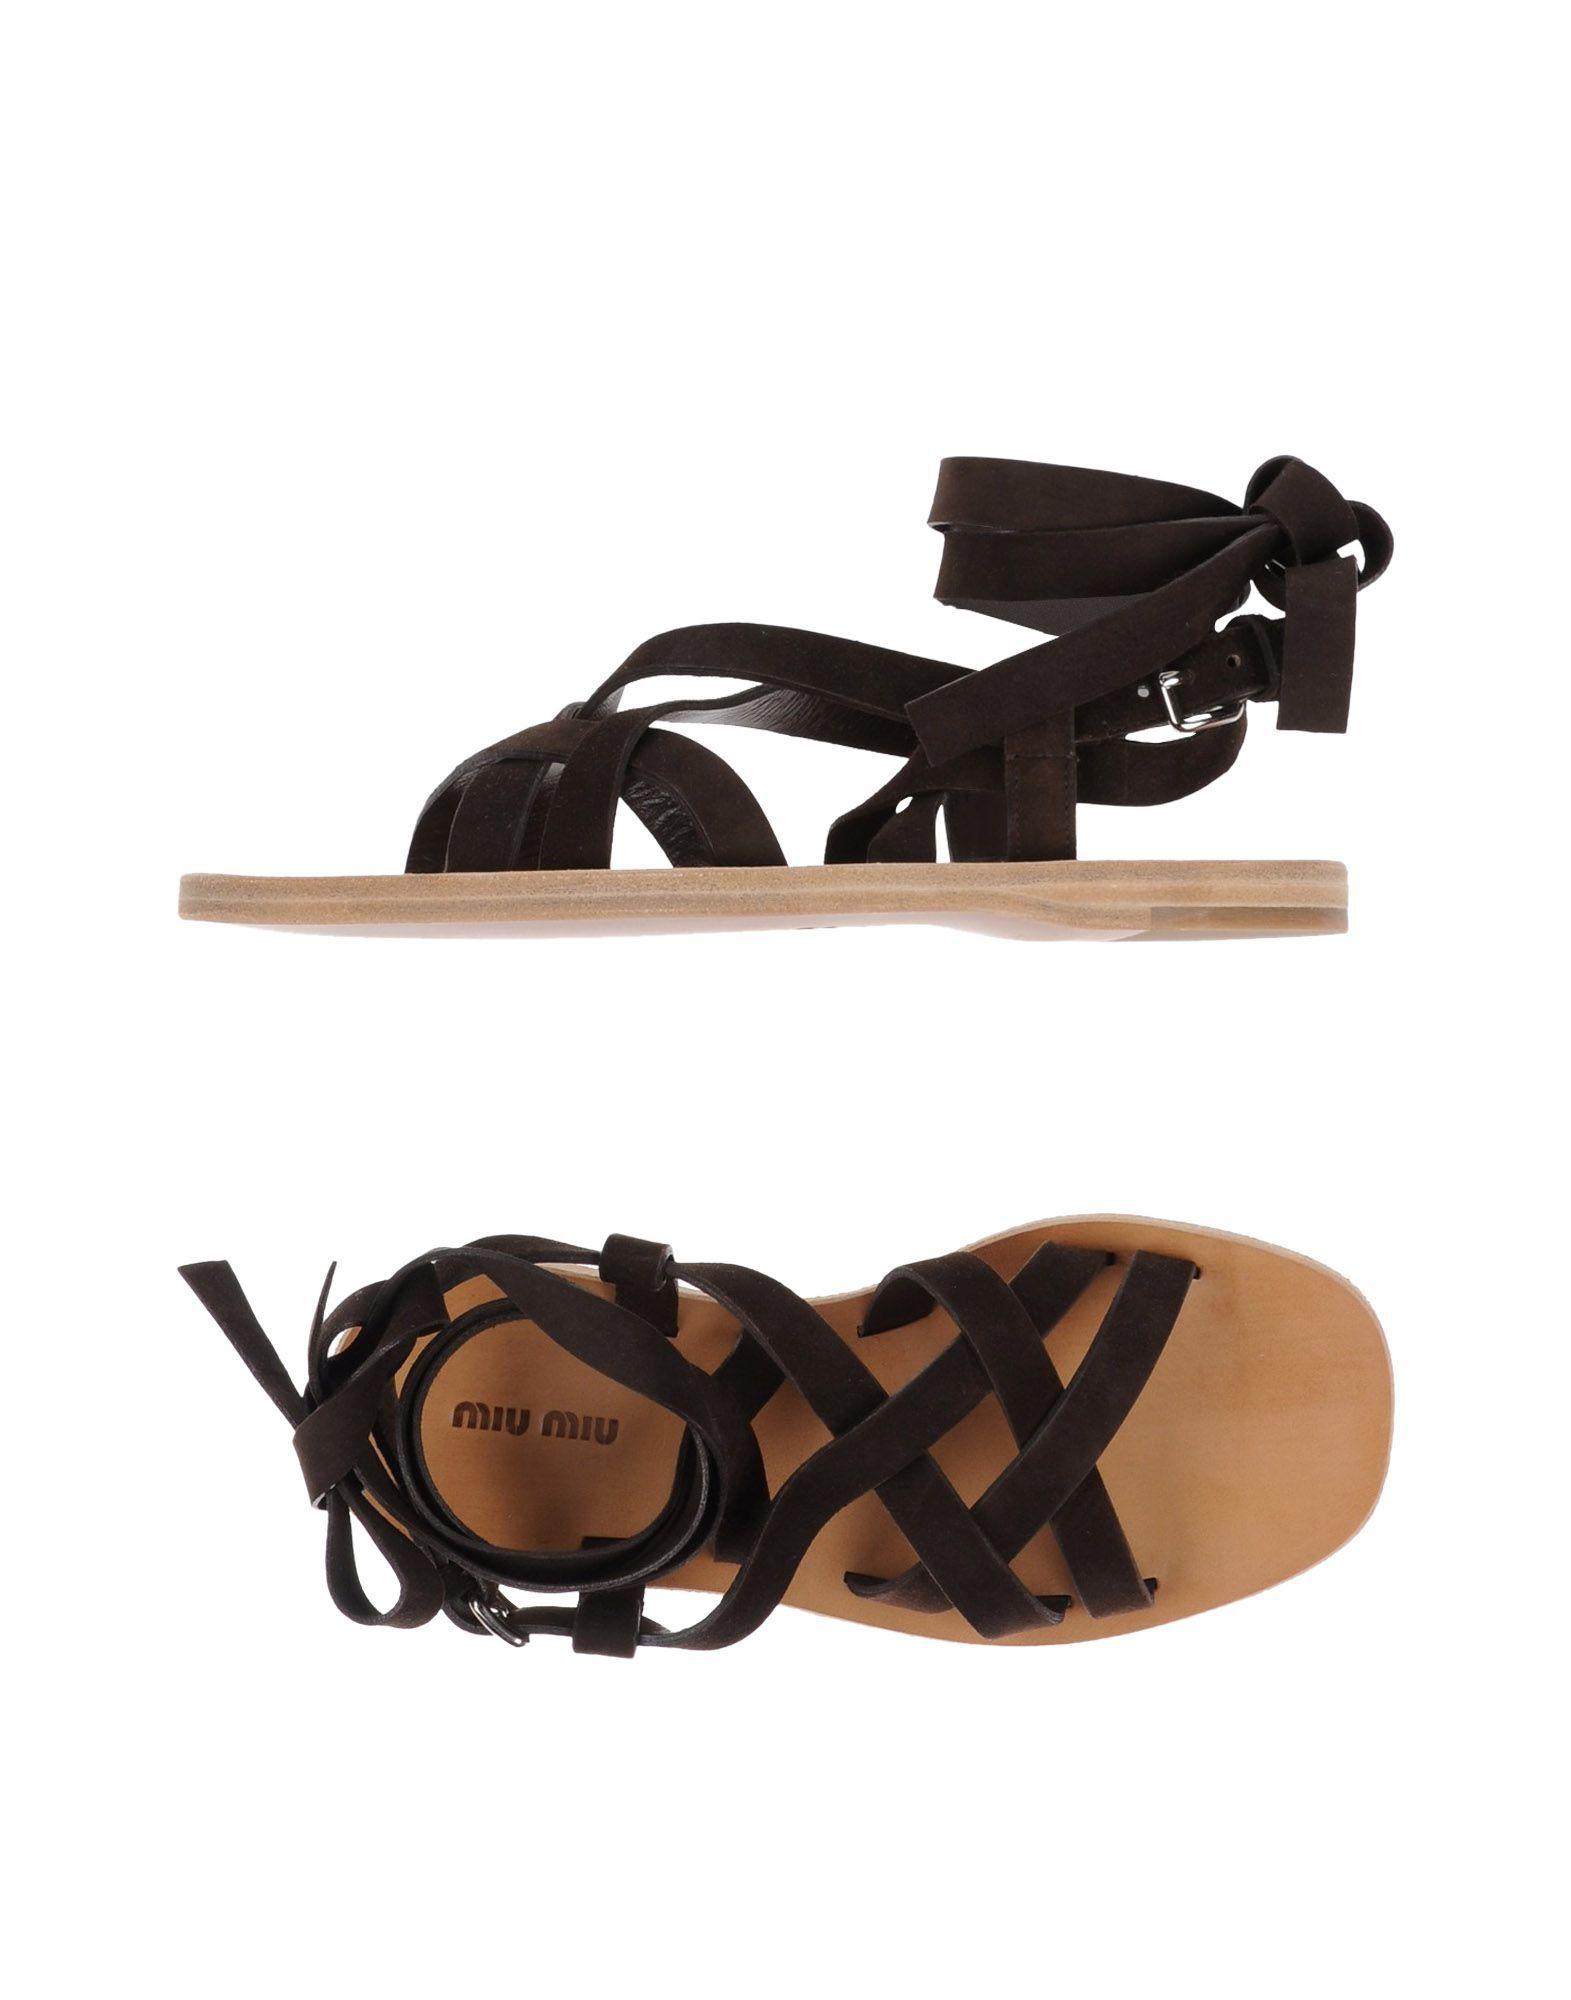 Miu Miu Dark Brown Leather Sandals